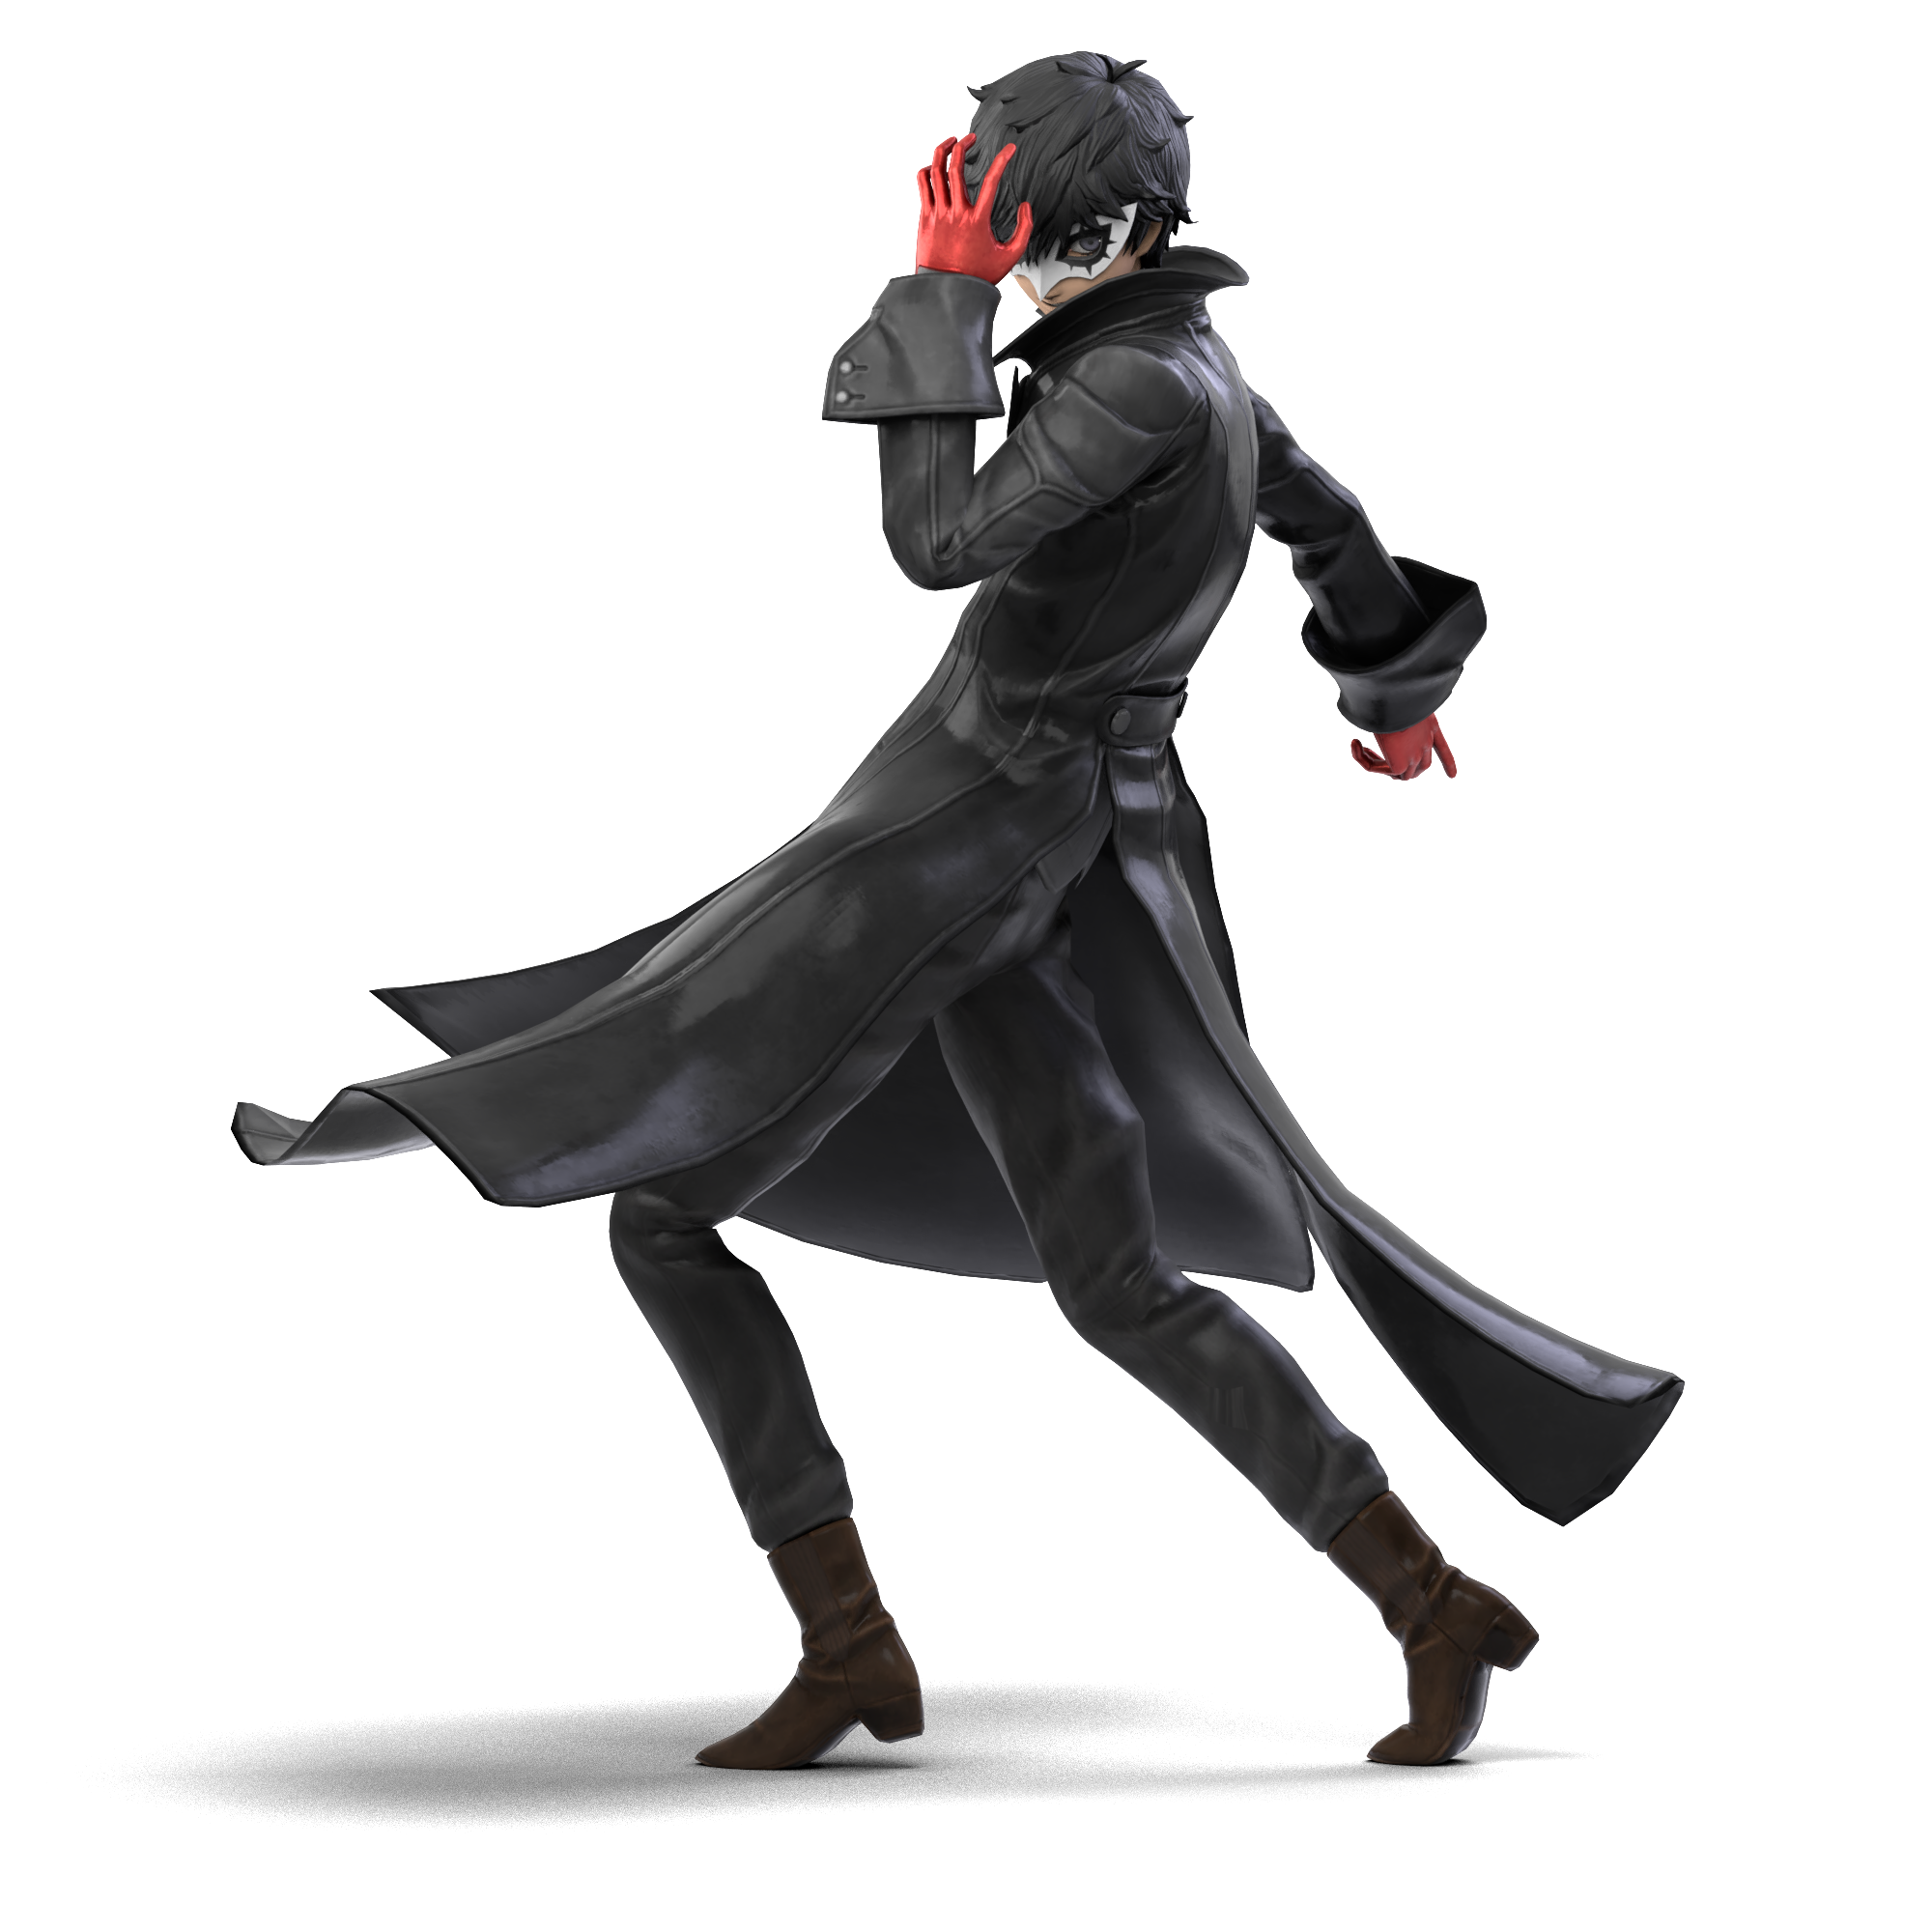 Ssbu Joker Classic Mode Portrait Pose By Unbecomingname On Deviantart